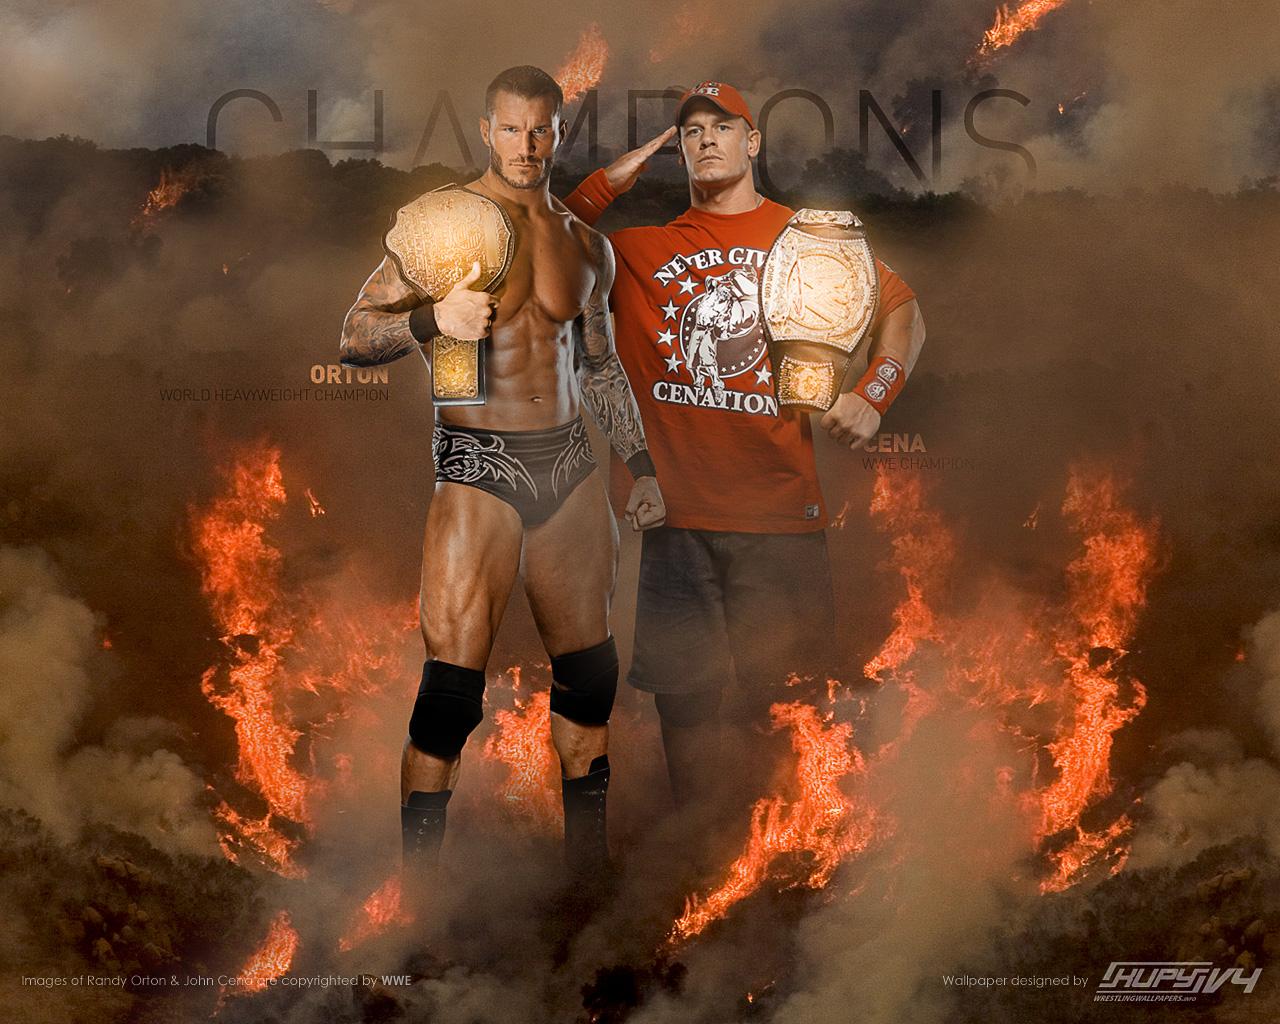 Randy Orton and John Cena as Champions wallpaper